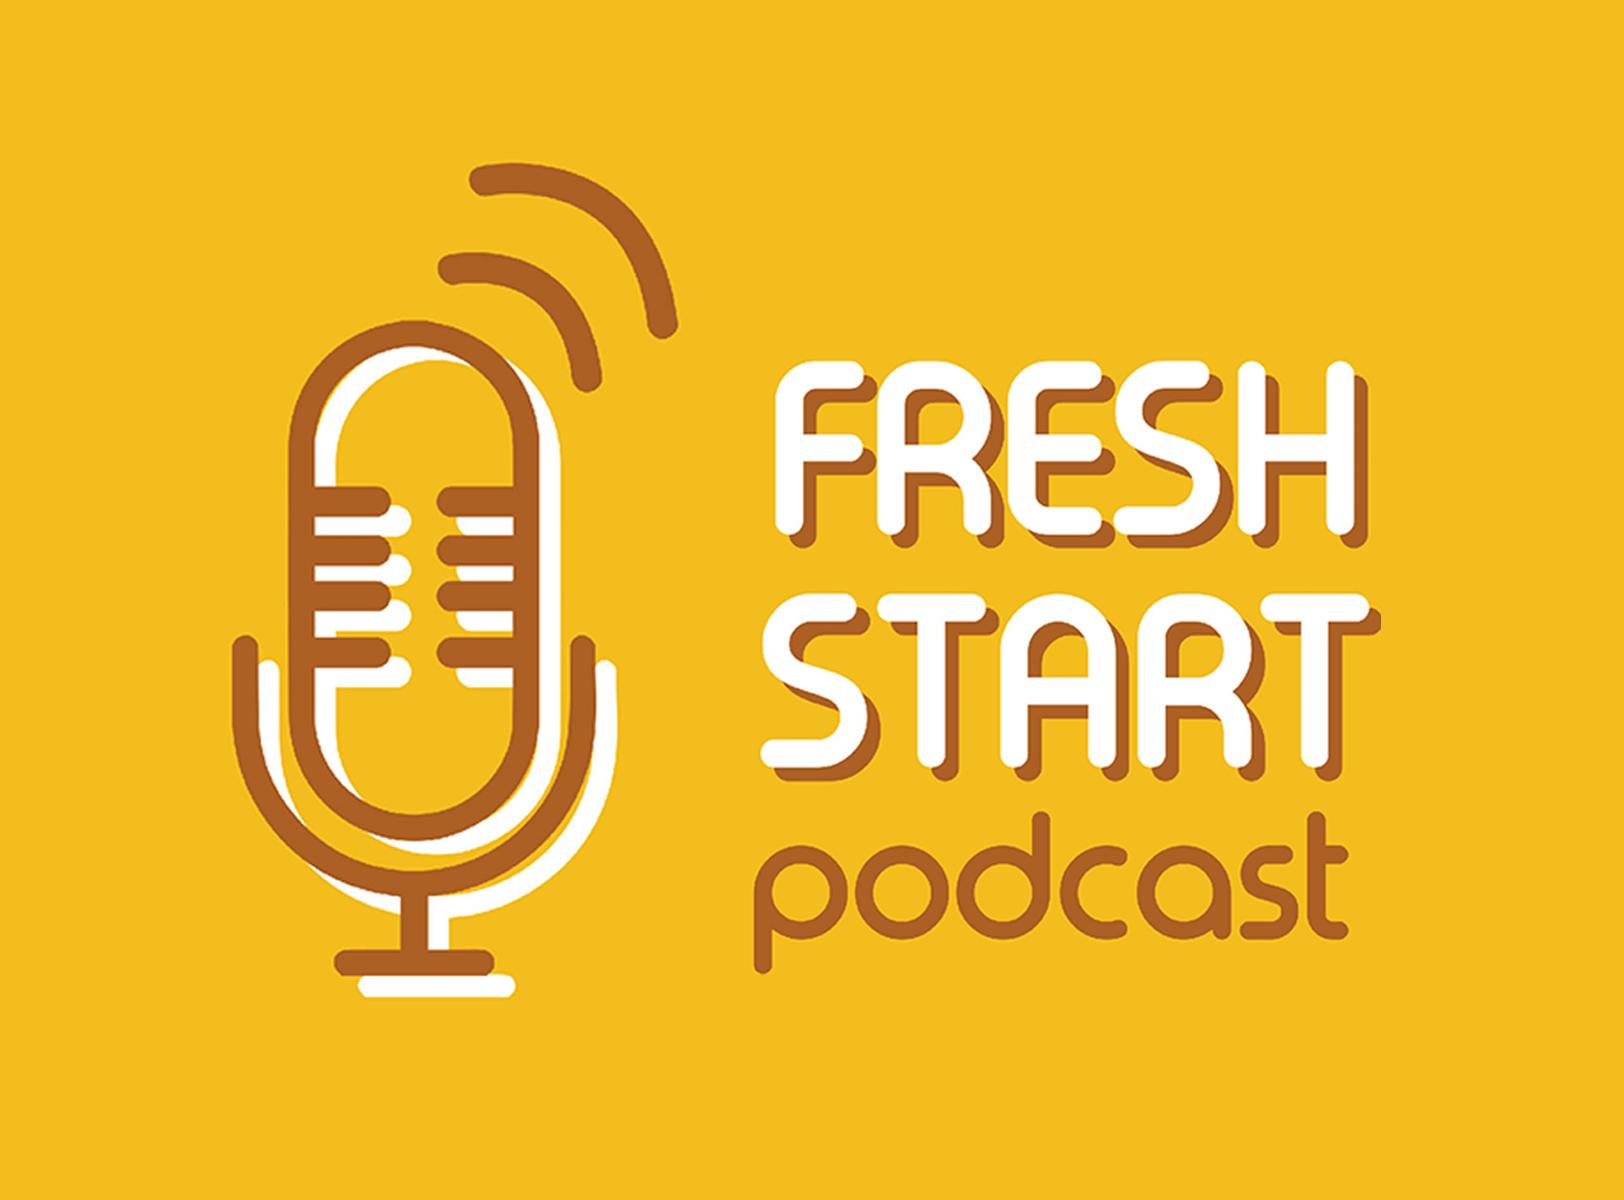 Fresh Start: Podcast News (10/1/2019 Tue.)